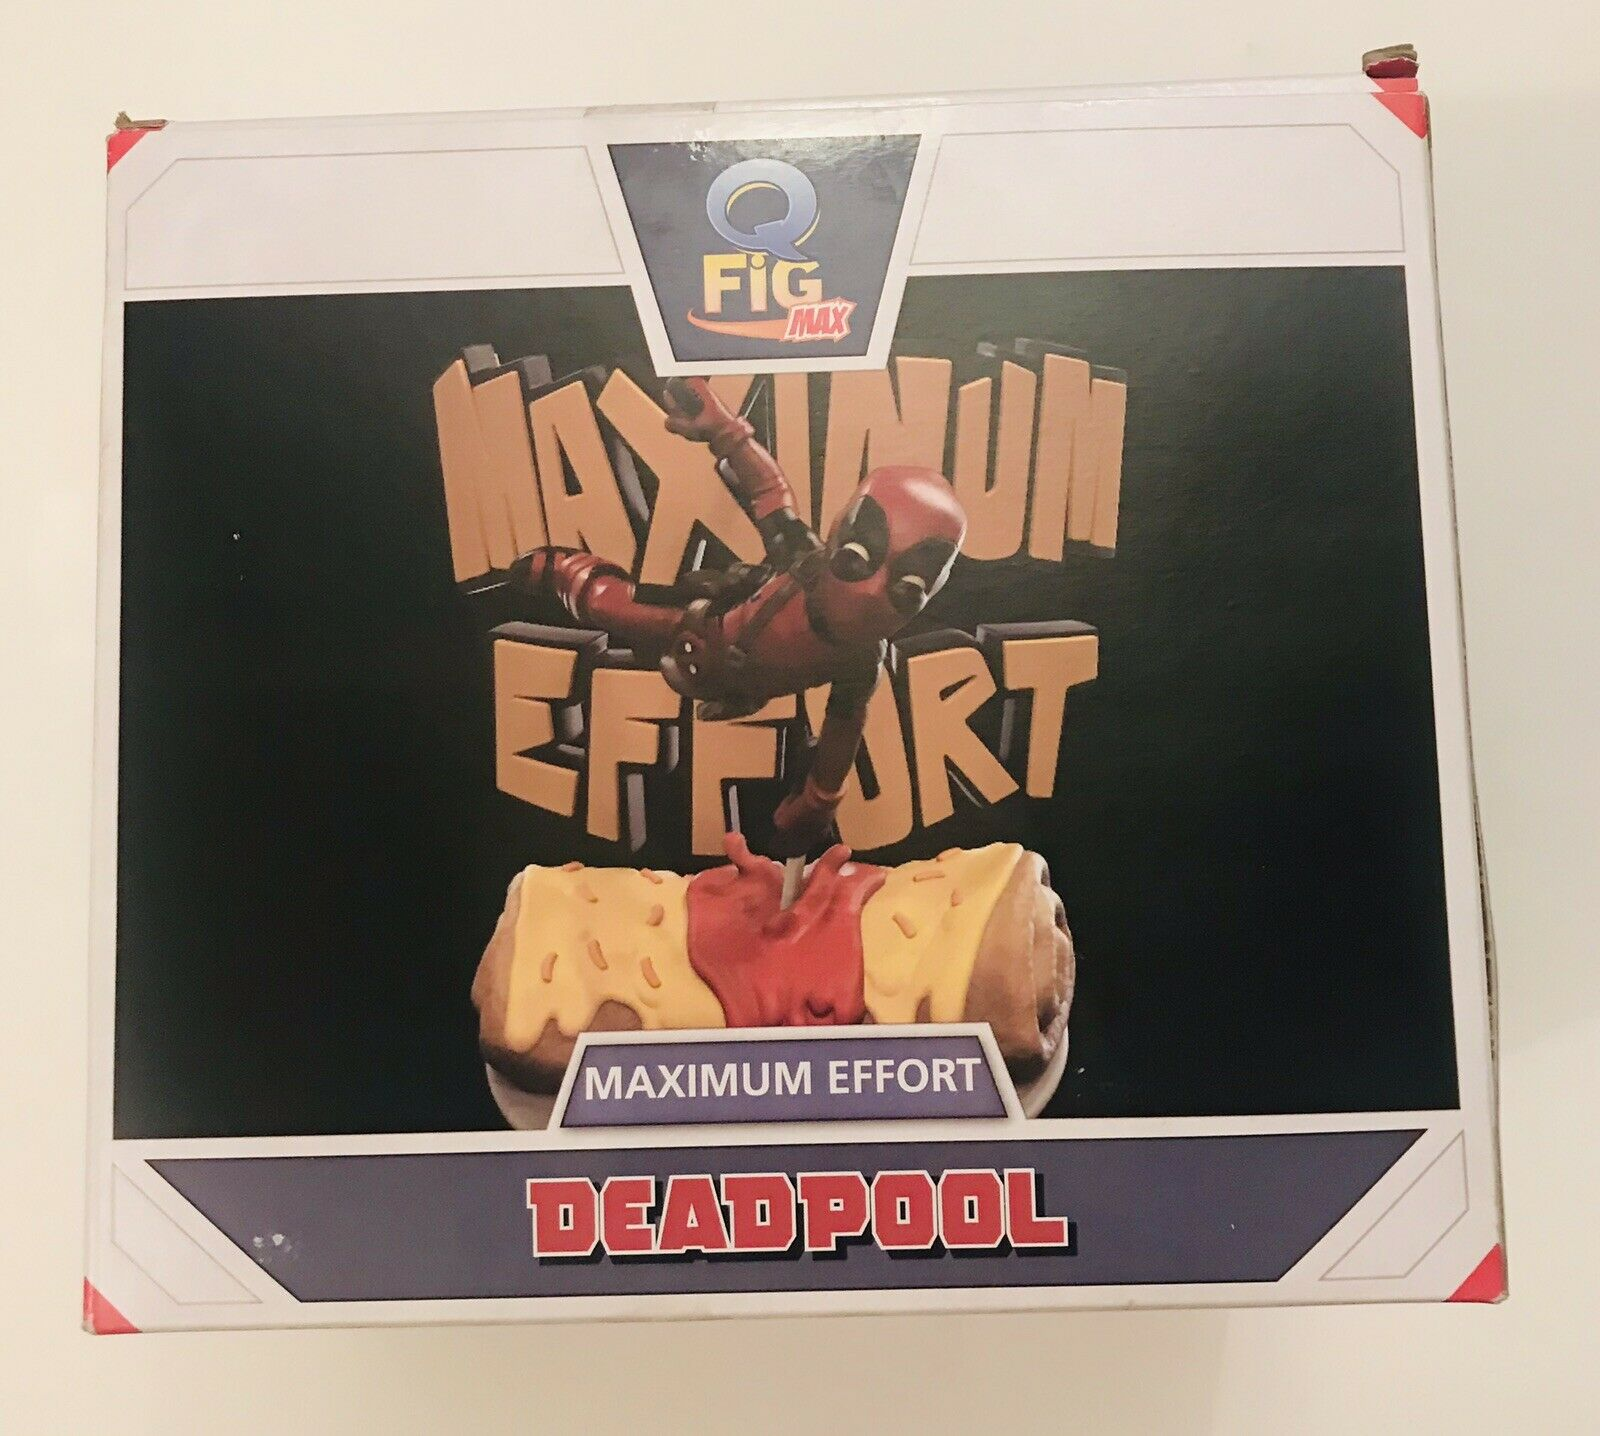 RARE Marvel Comics Q Fig Max Diorama PVC Statue Figure Figure Figure  Deadpool Maximum Effort  281987